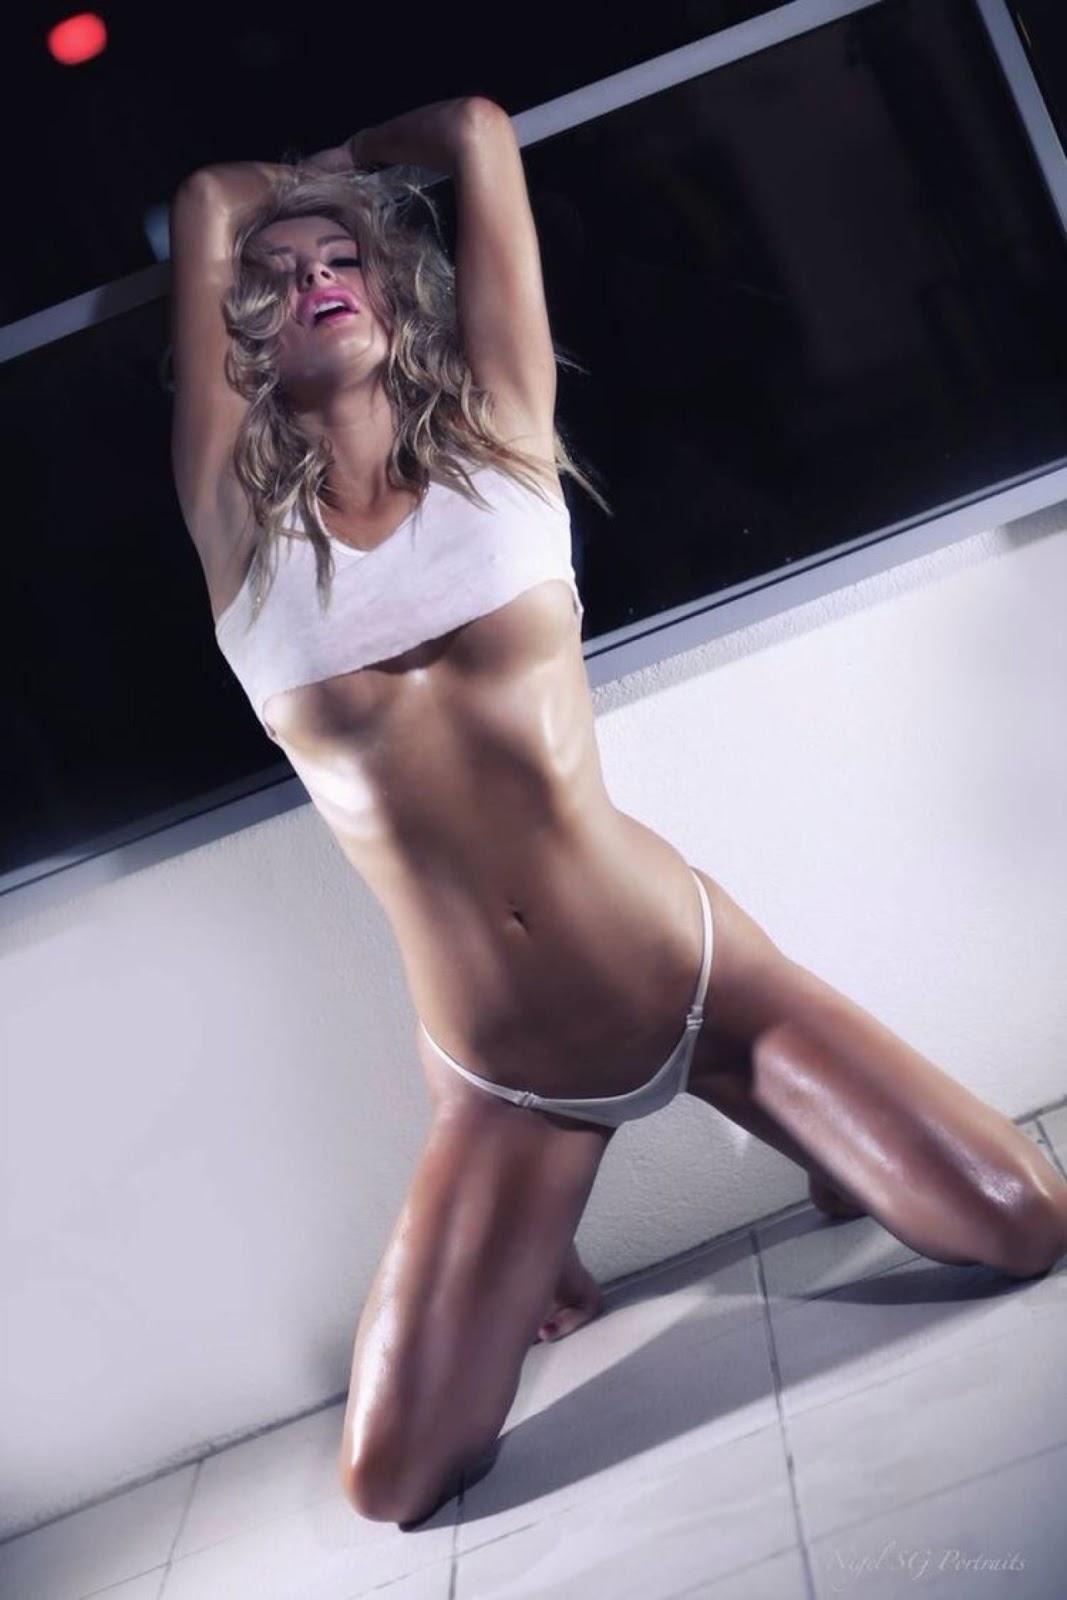 privategirls escorts find sex app Sydney